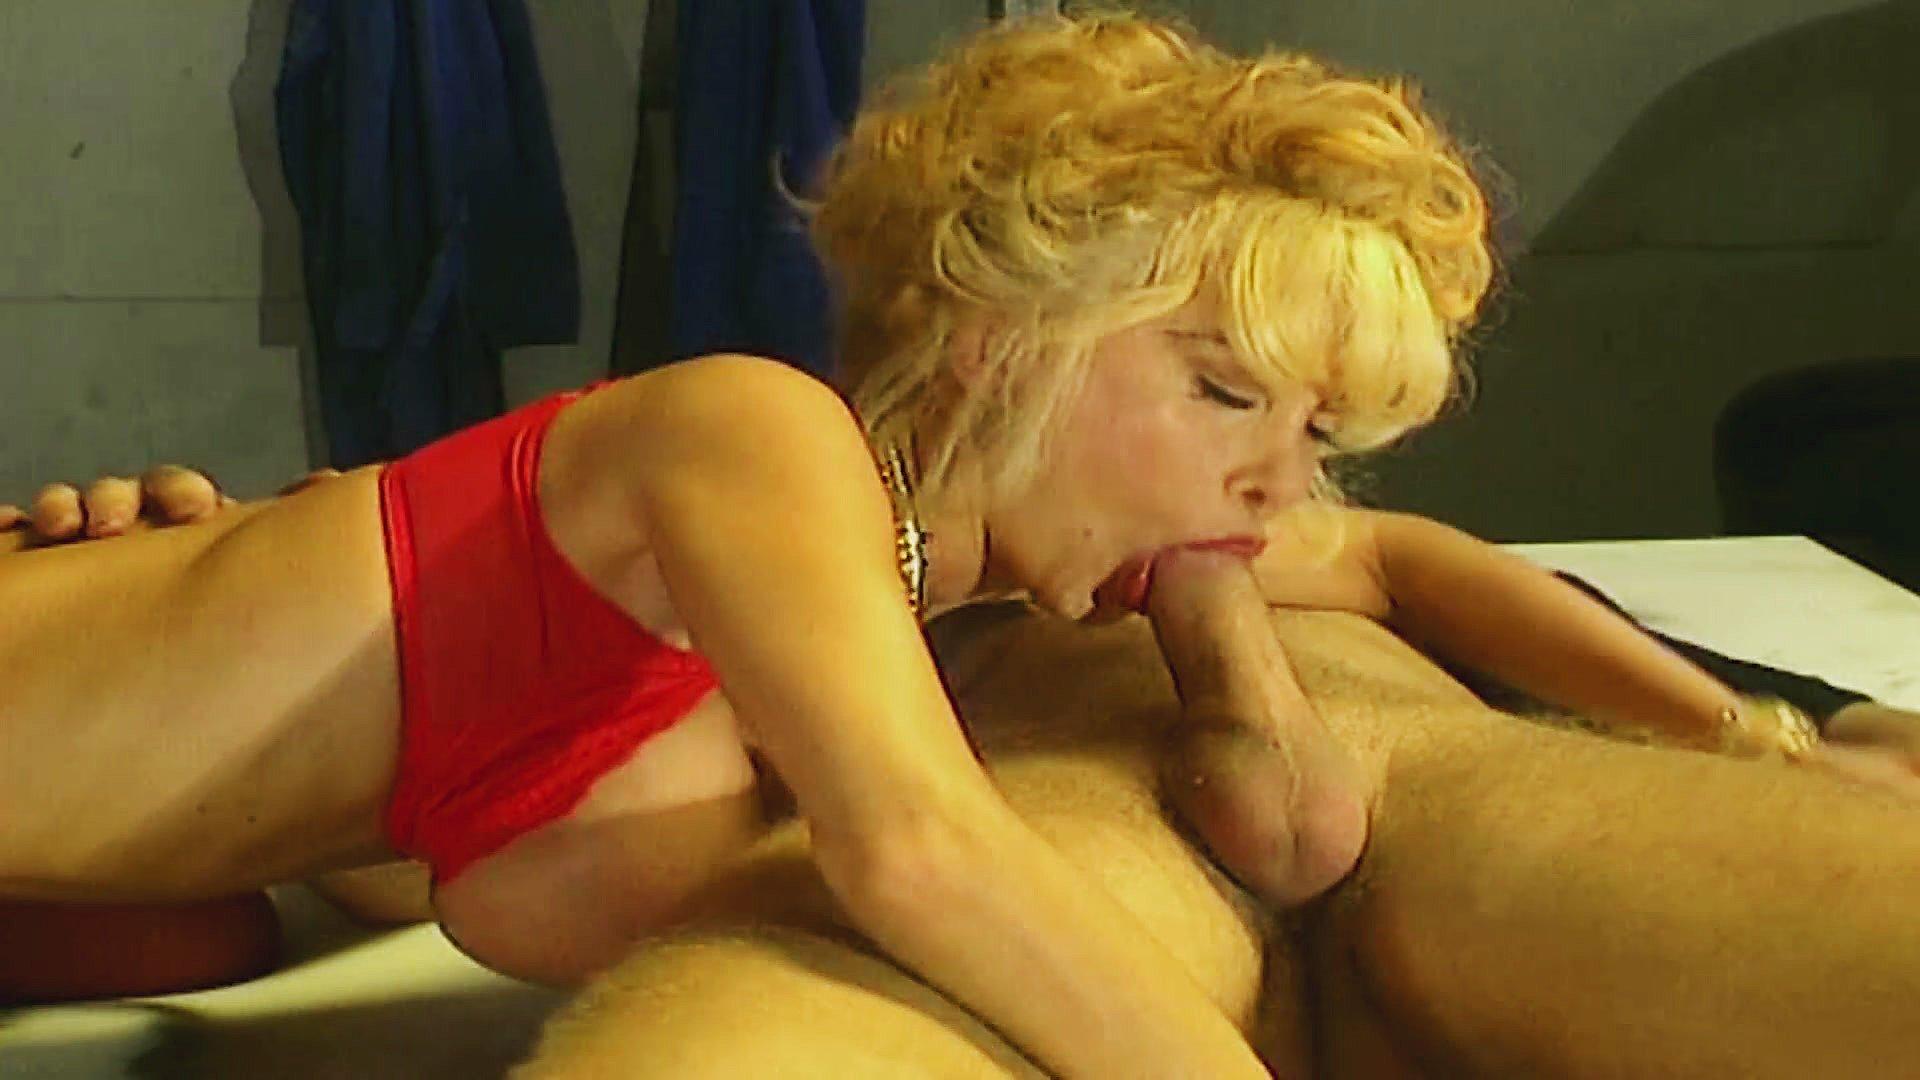 xxx pics Sudbury girl shows tits